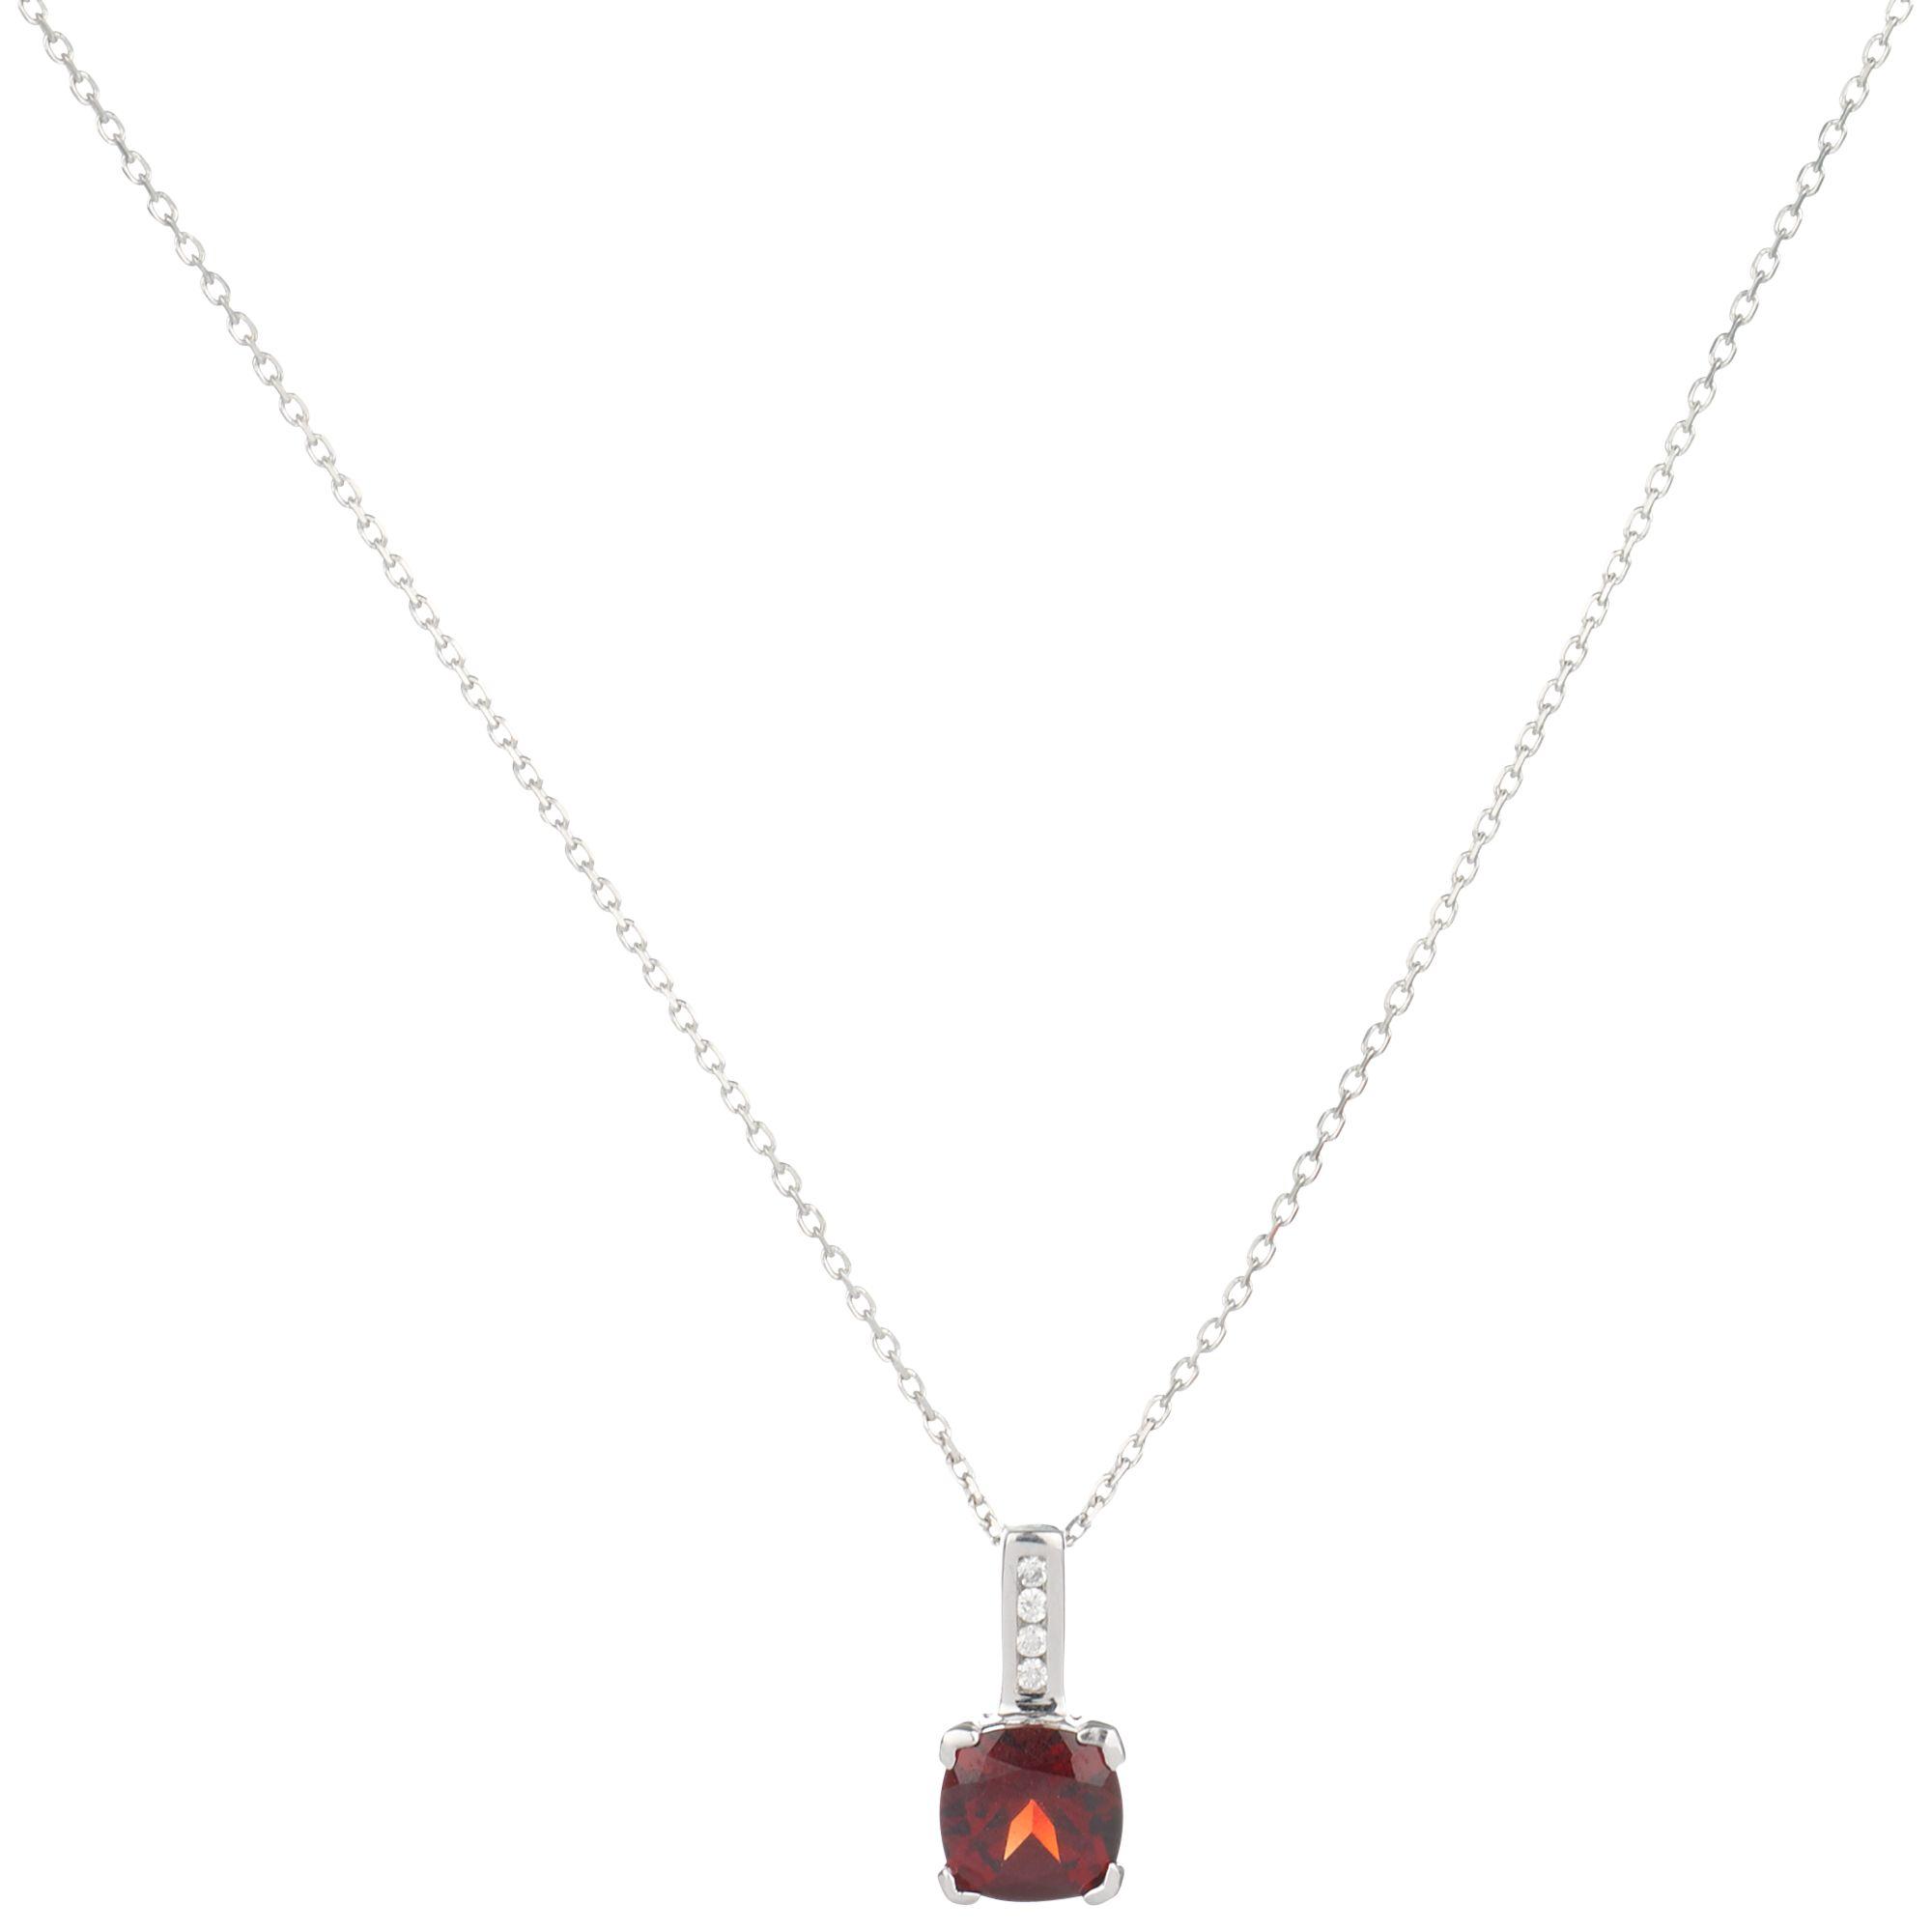 9ct White Gold Garnet Cushion Cut Diamond Pendant Necklace